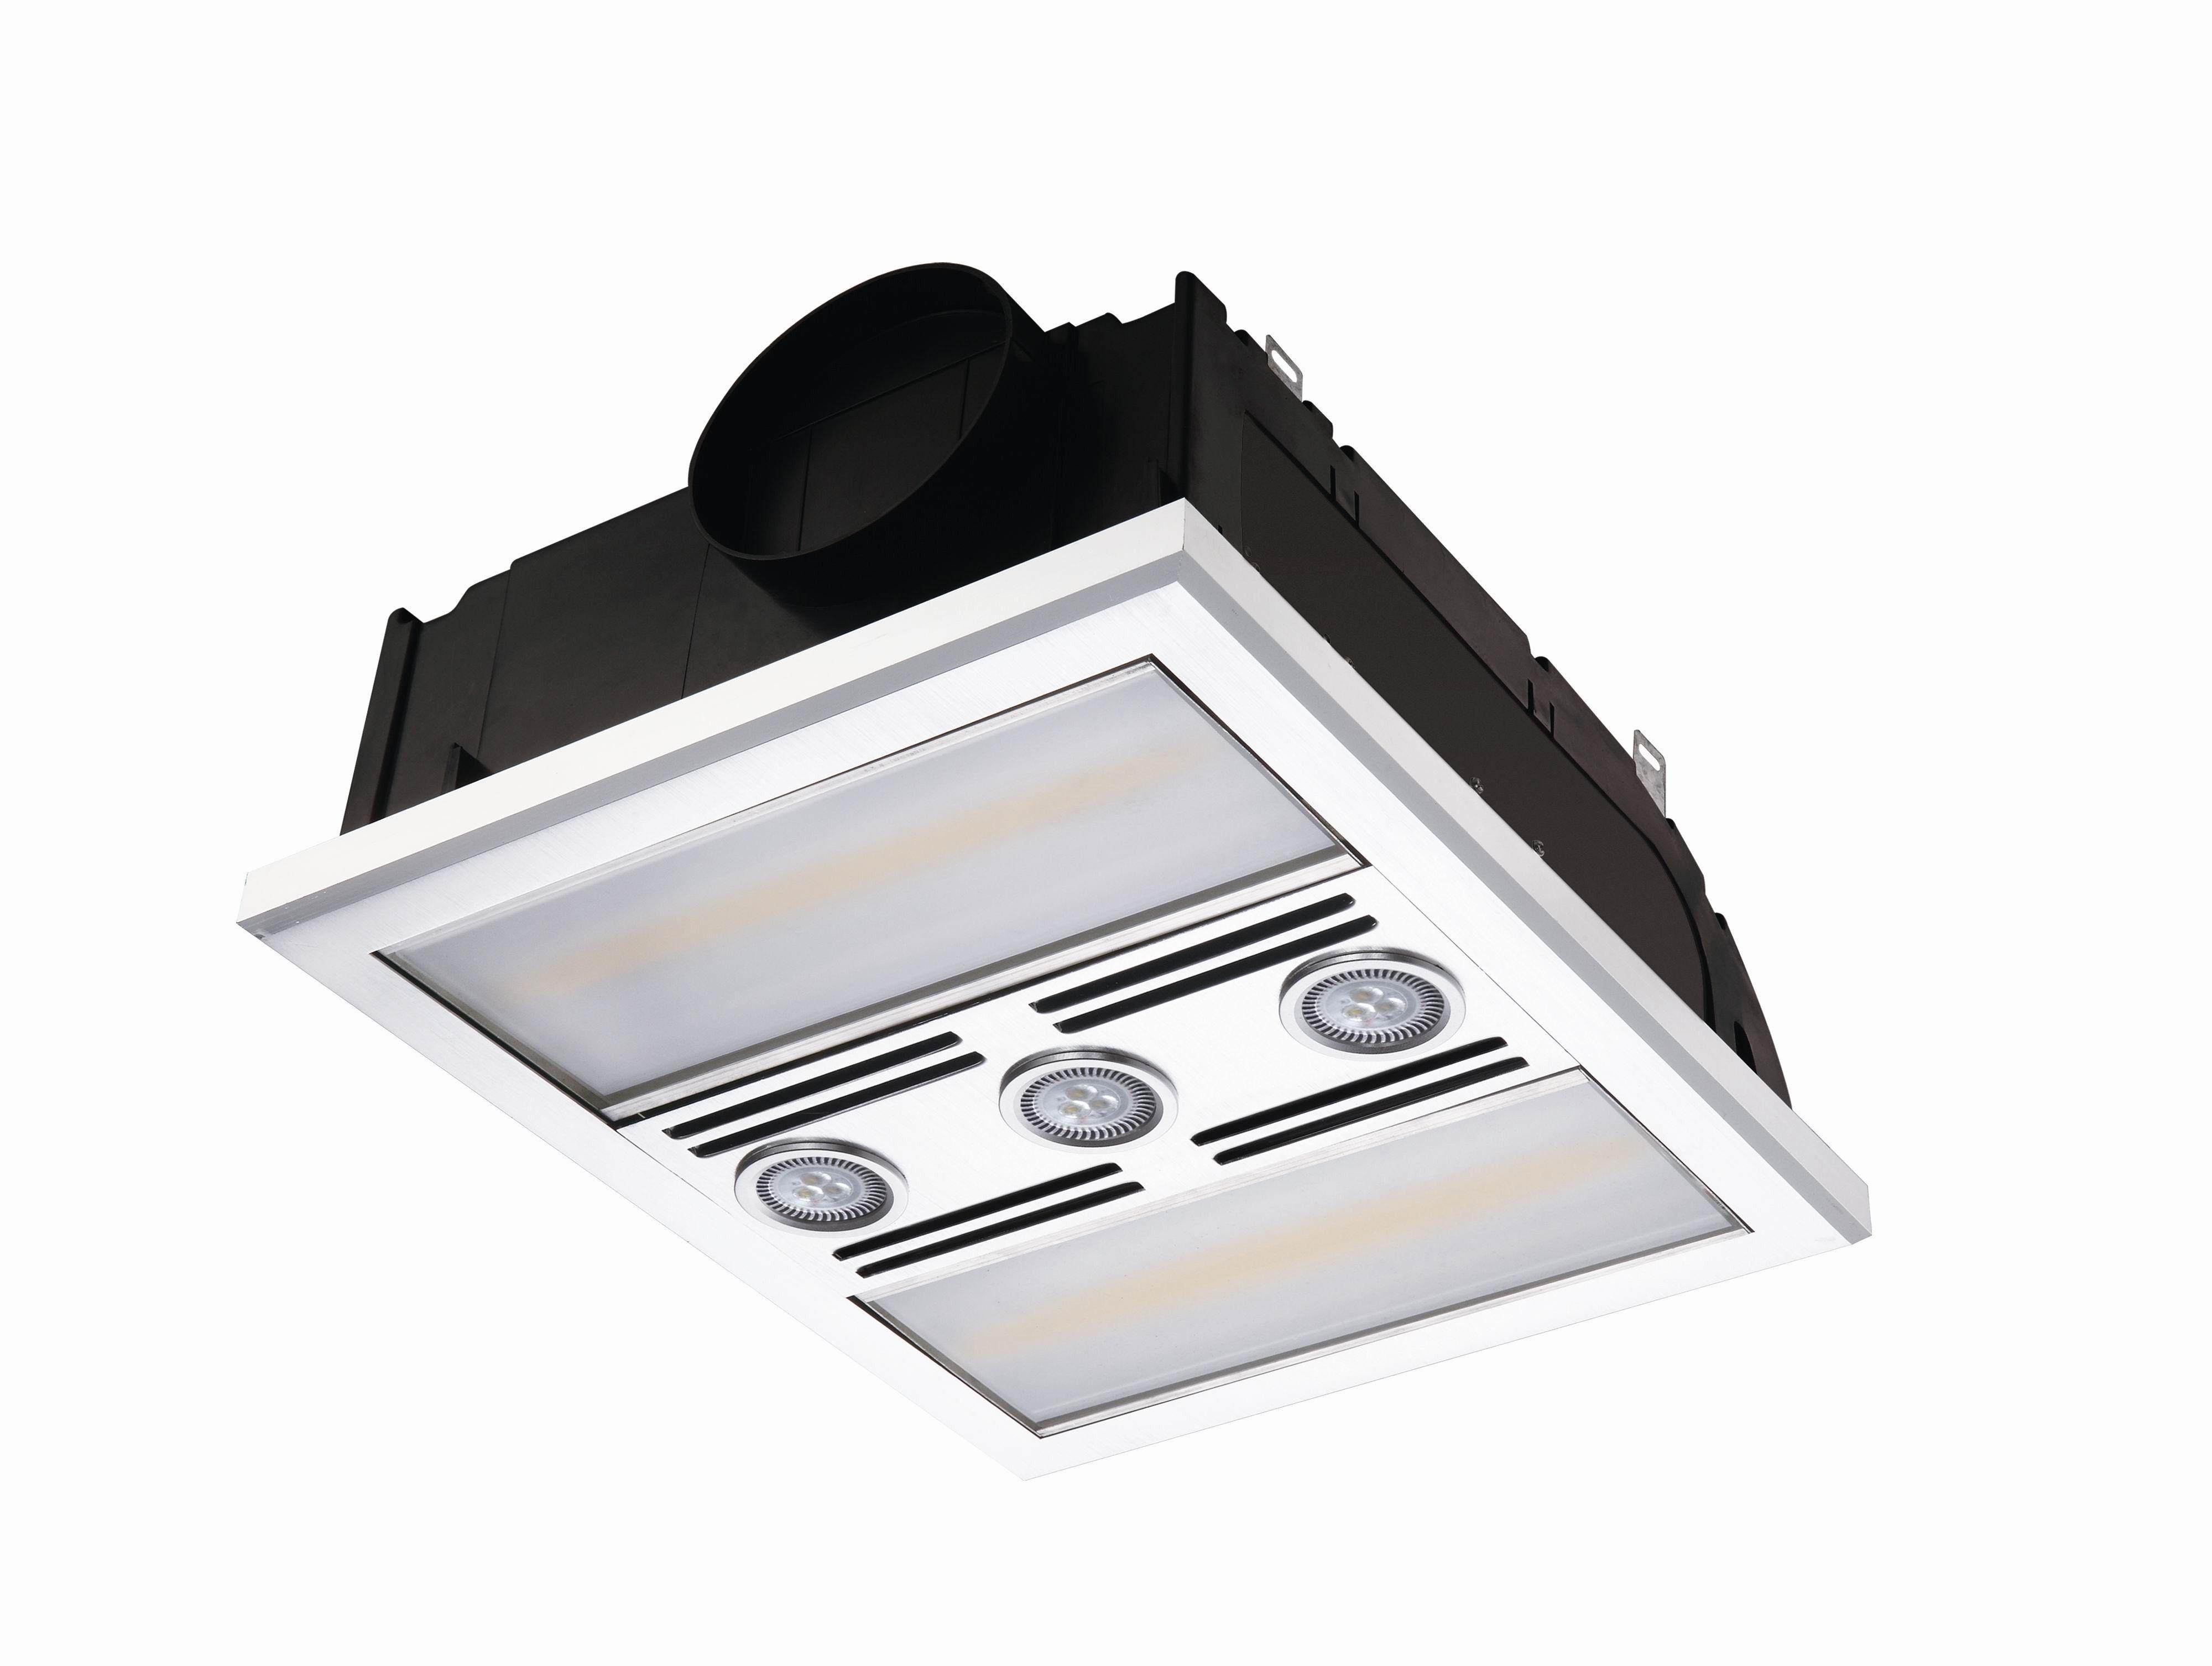 Best Bathroom Heat Lamp Fan Bathroom Heater Bathroom Exhaust